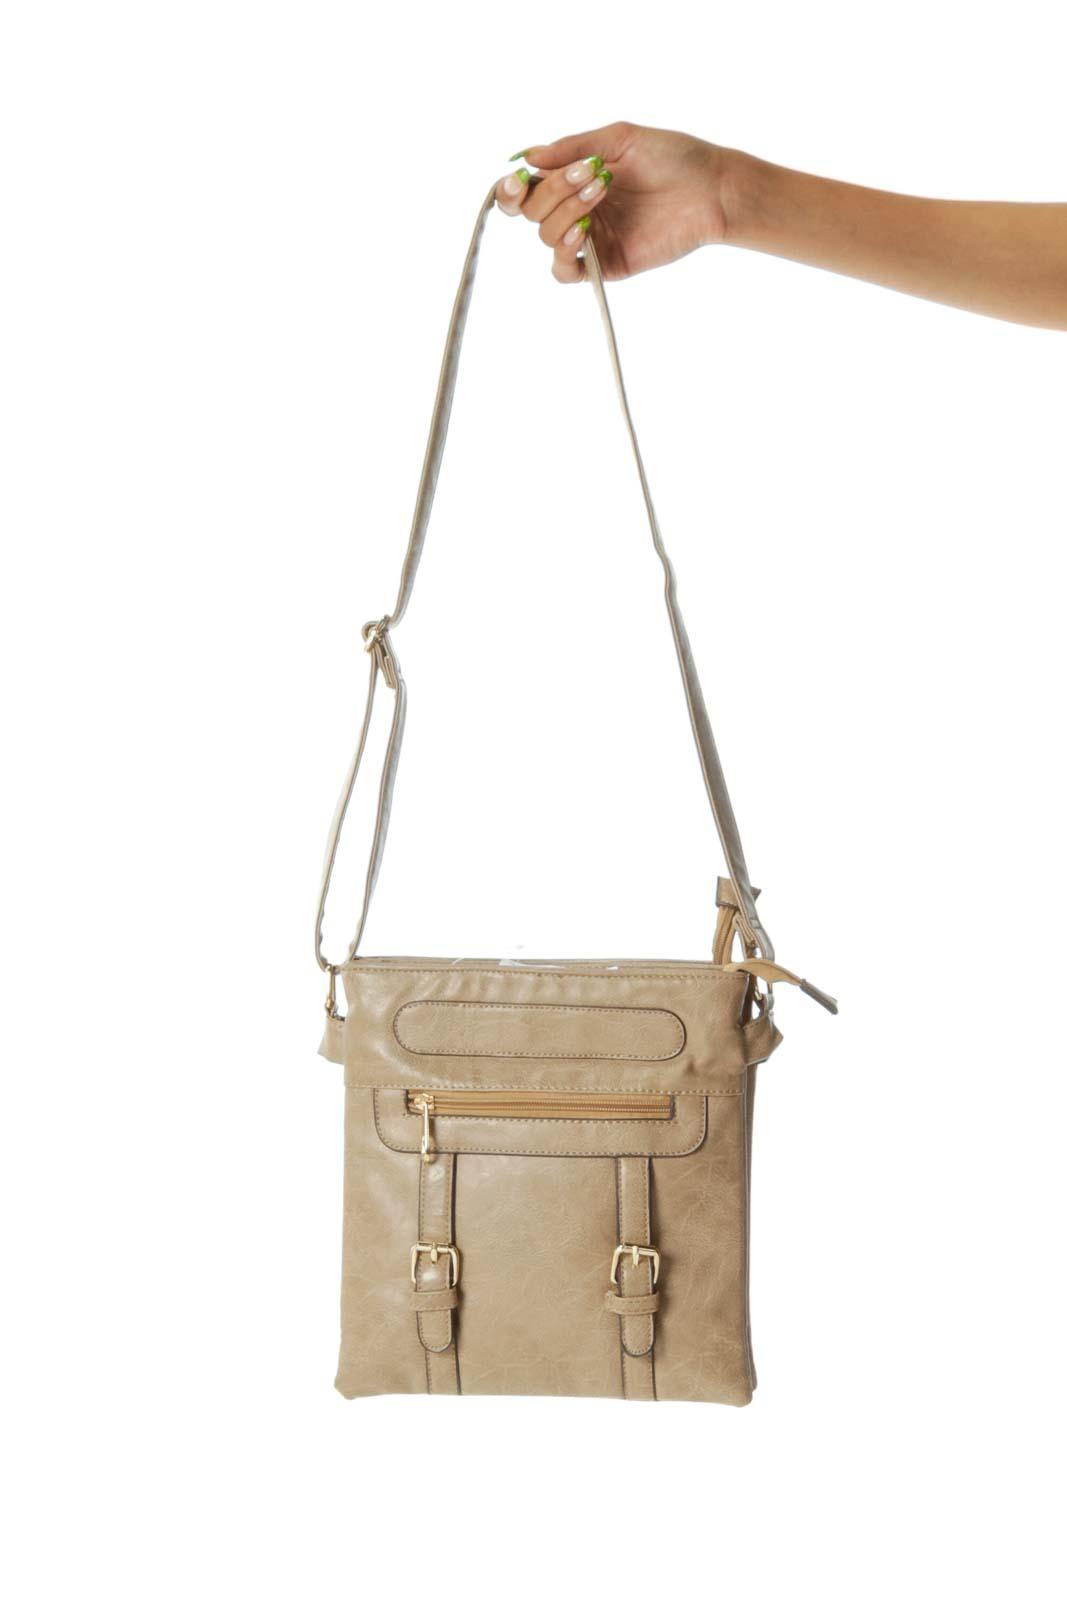 Beige Multi-Pockets Gold-Hardware Crossbody Bag